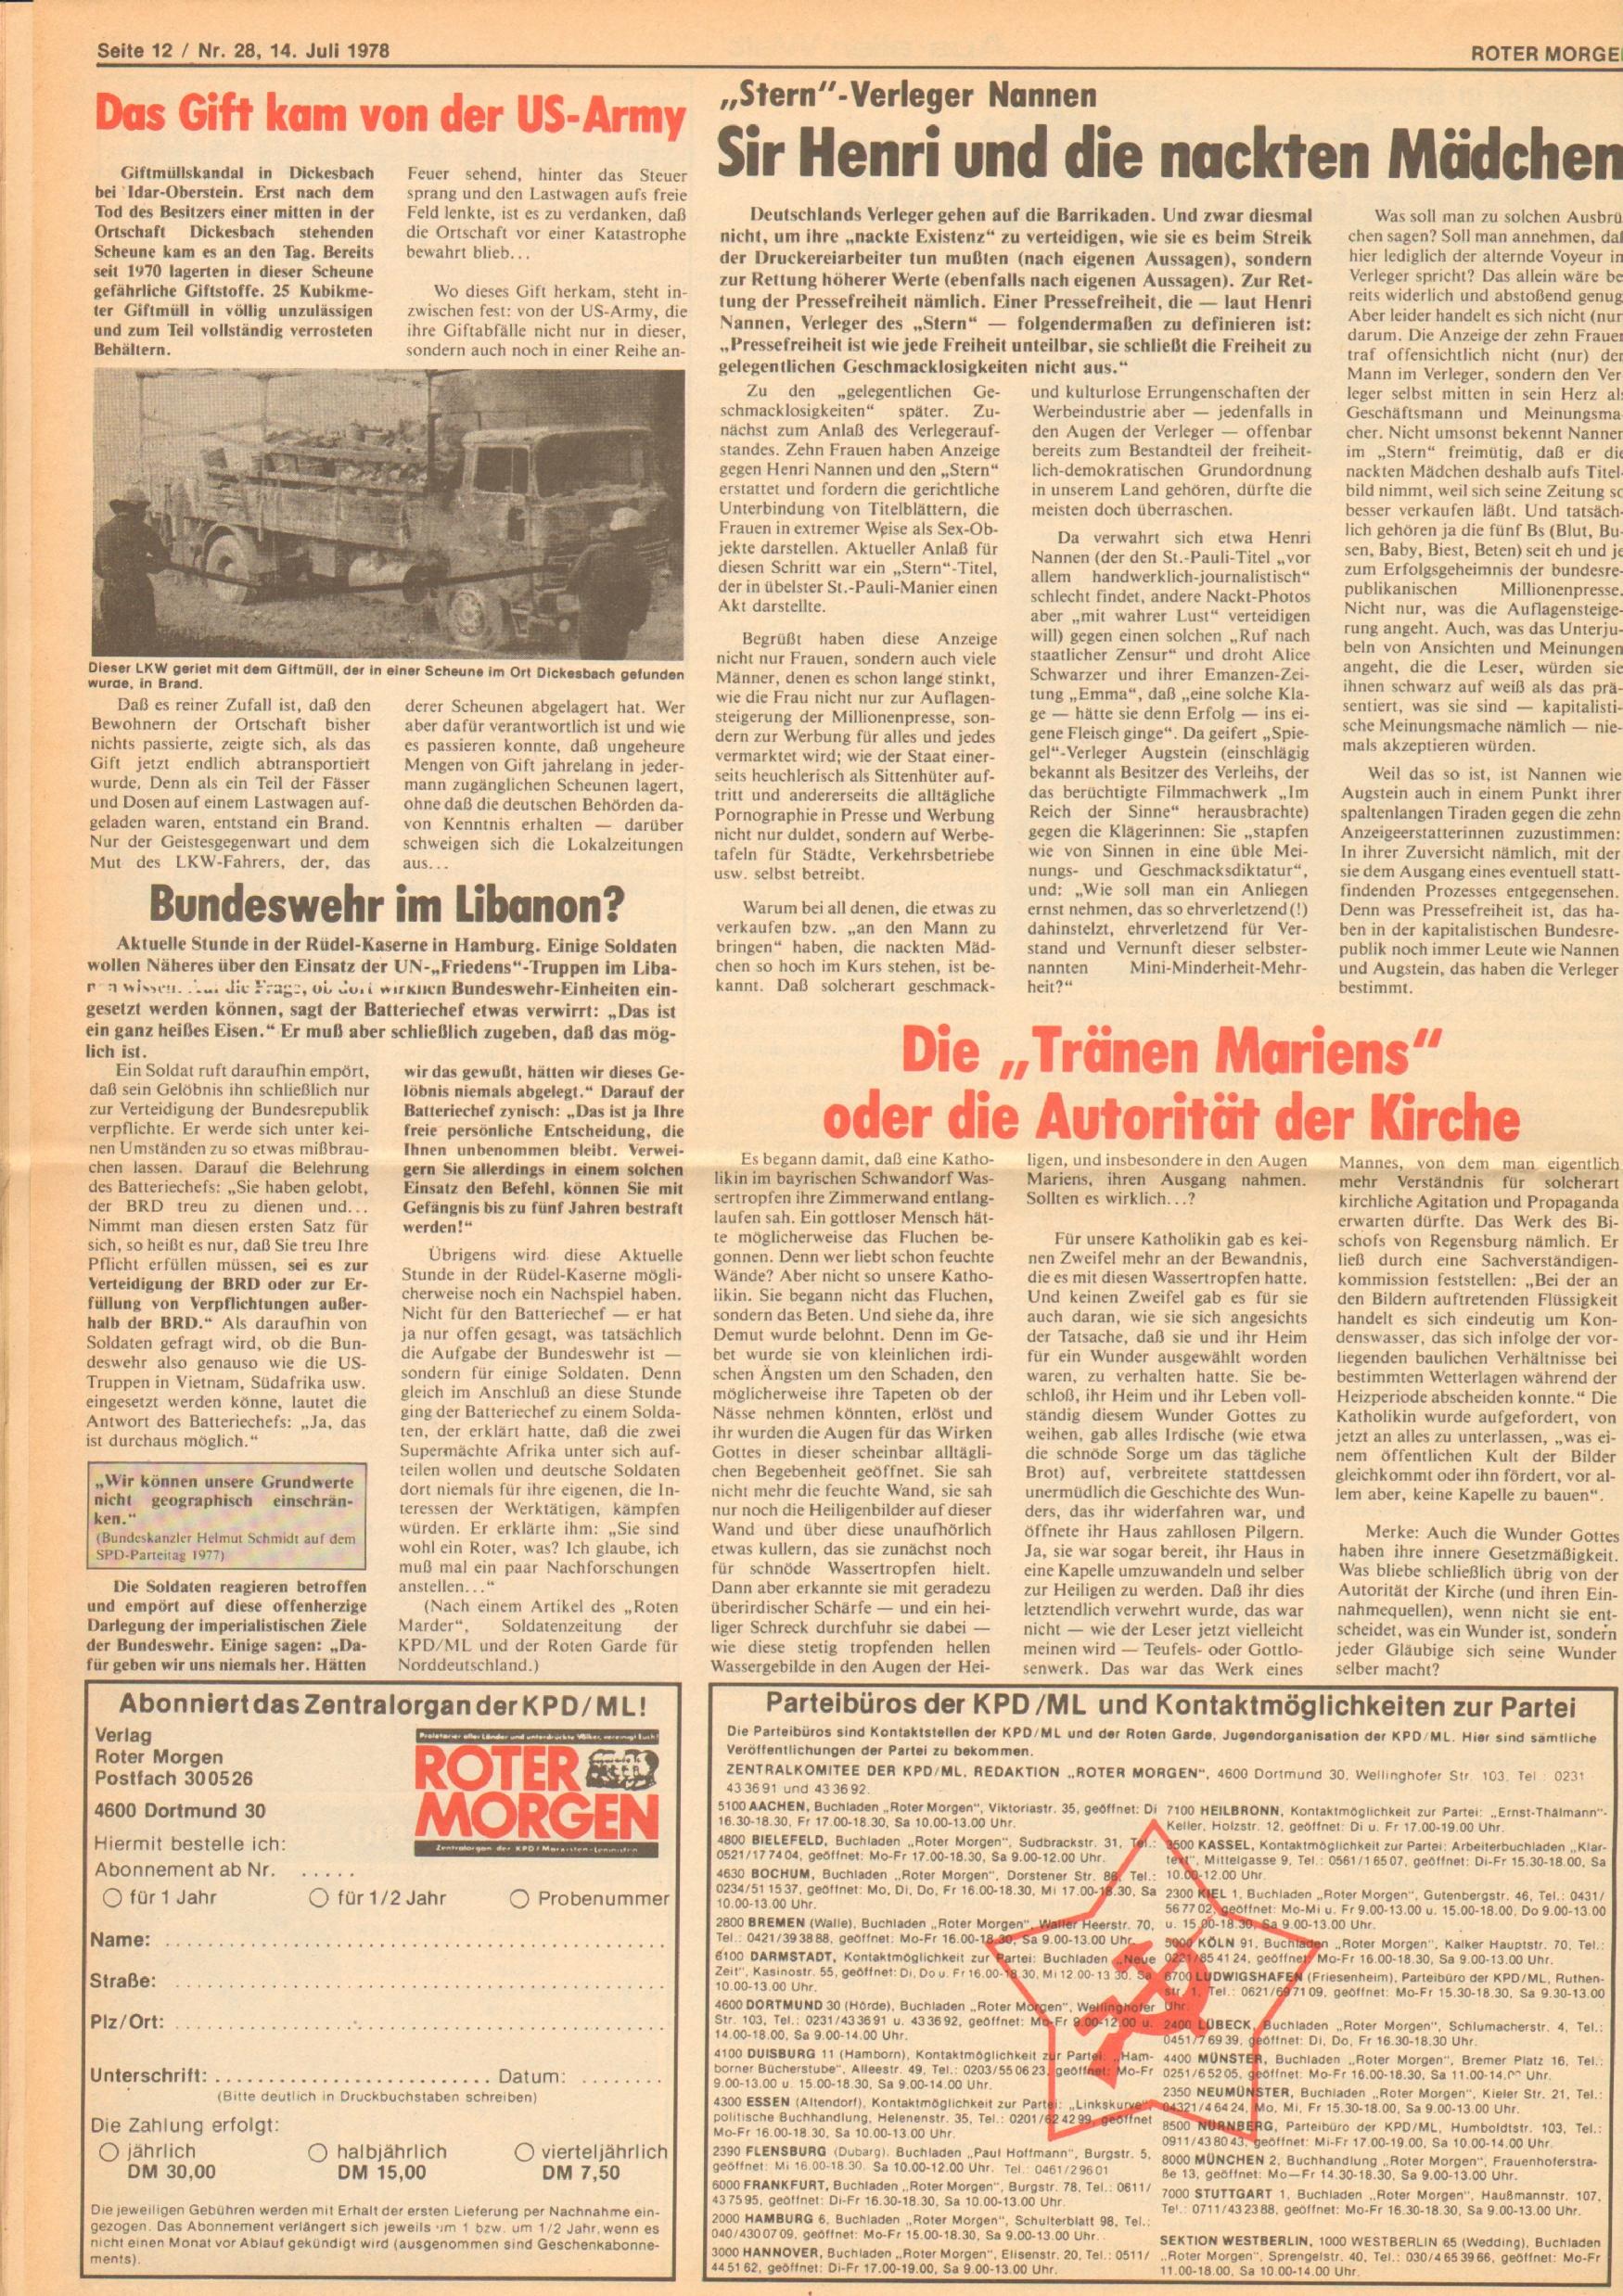 Roter Morgen, 12. Jg., 16. Juli 1978, Nr. 28, Seite 12